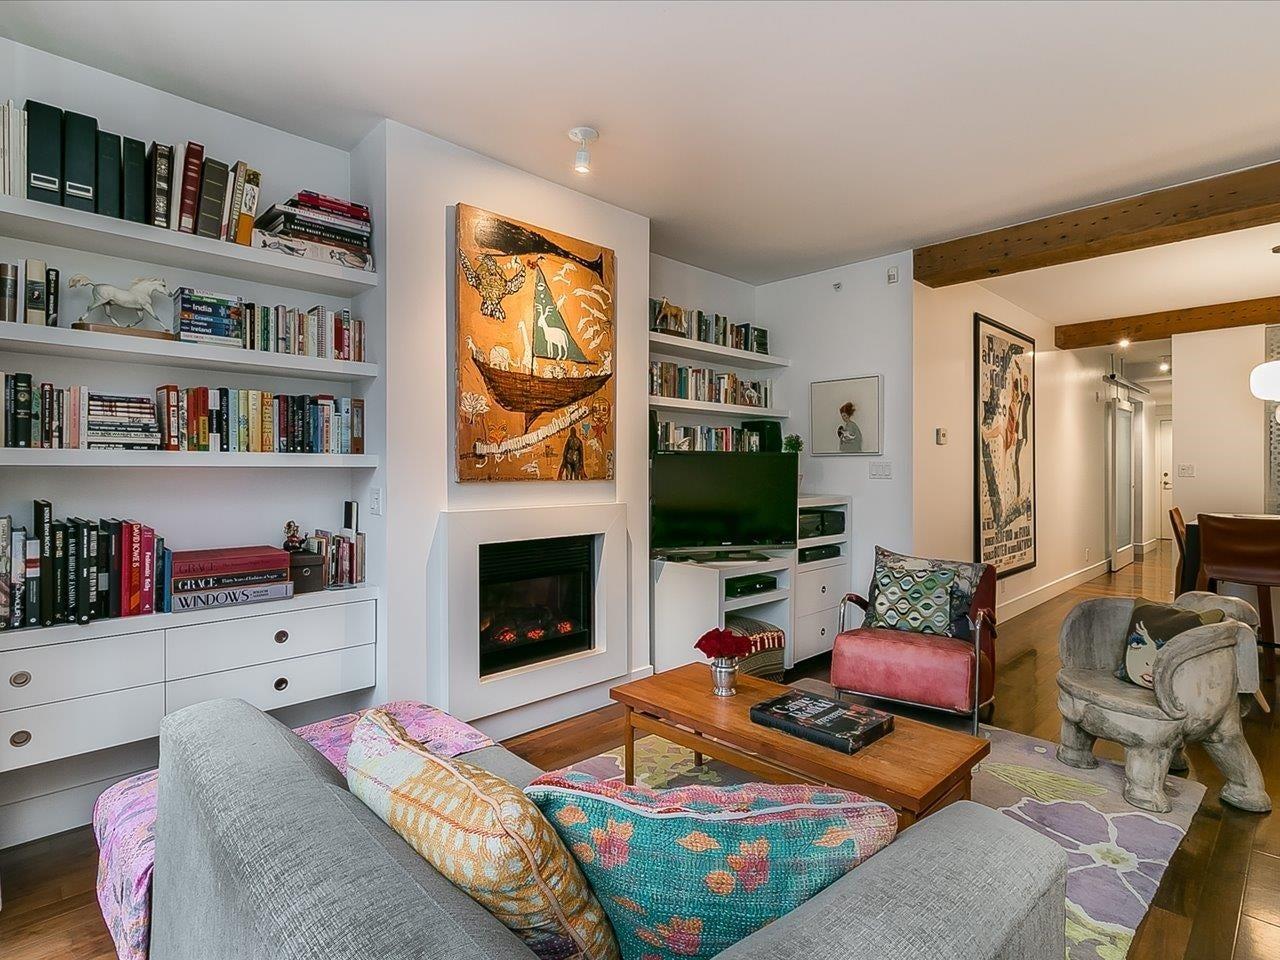 212 1275 HAMILTON STREET - Yaletown Apartment/Condo for sale, 1 Bedroom (R2626422) - #1